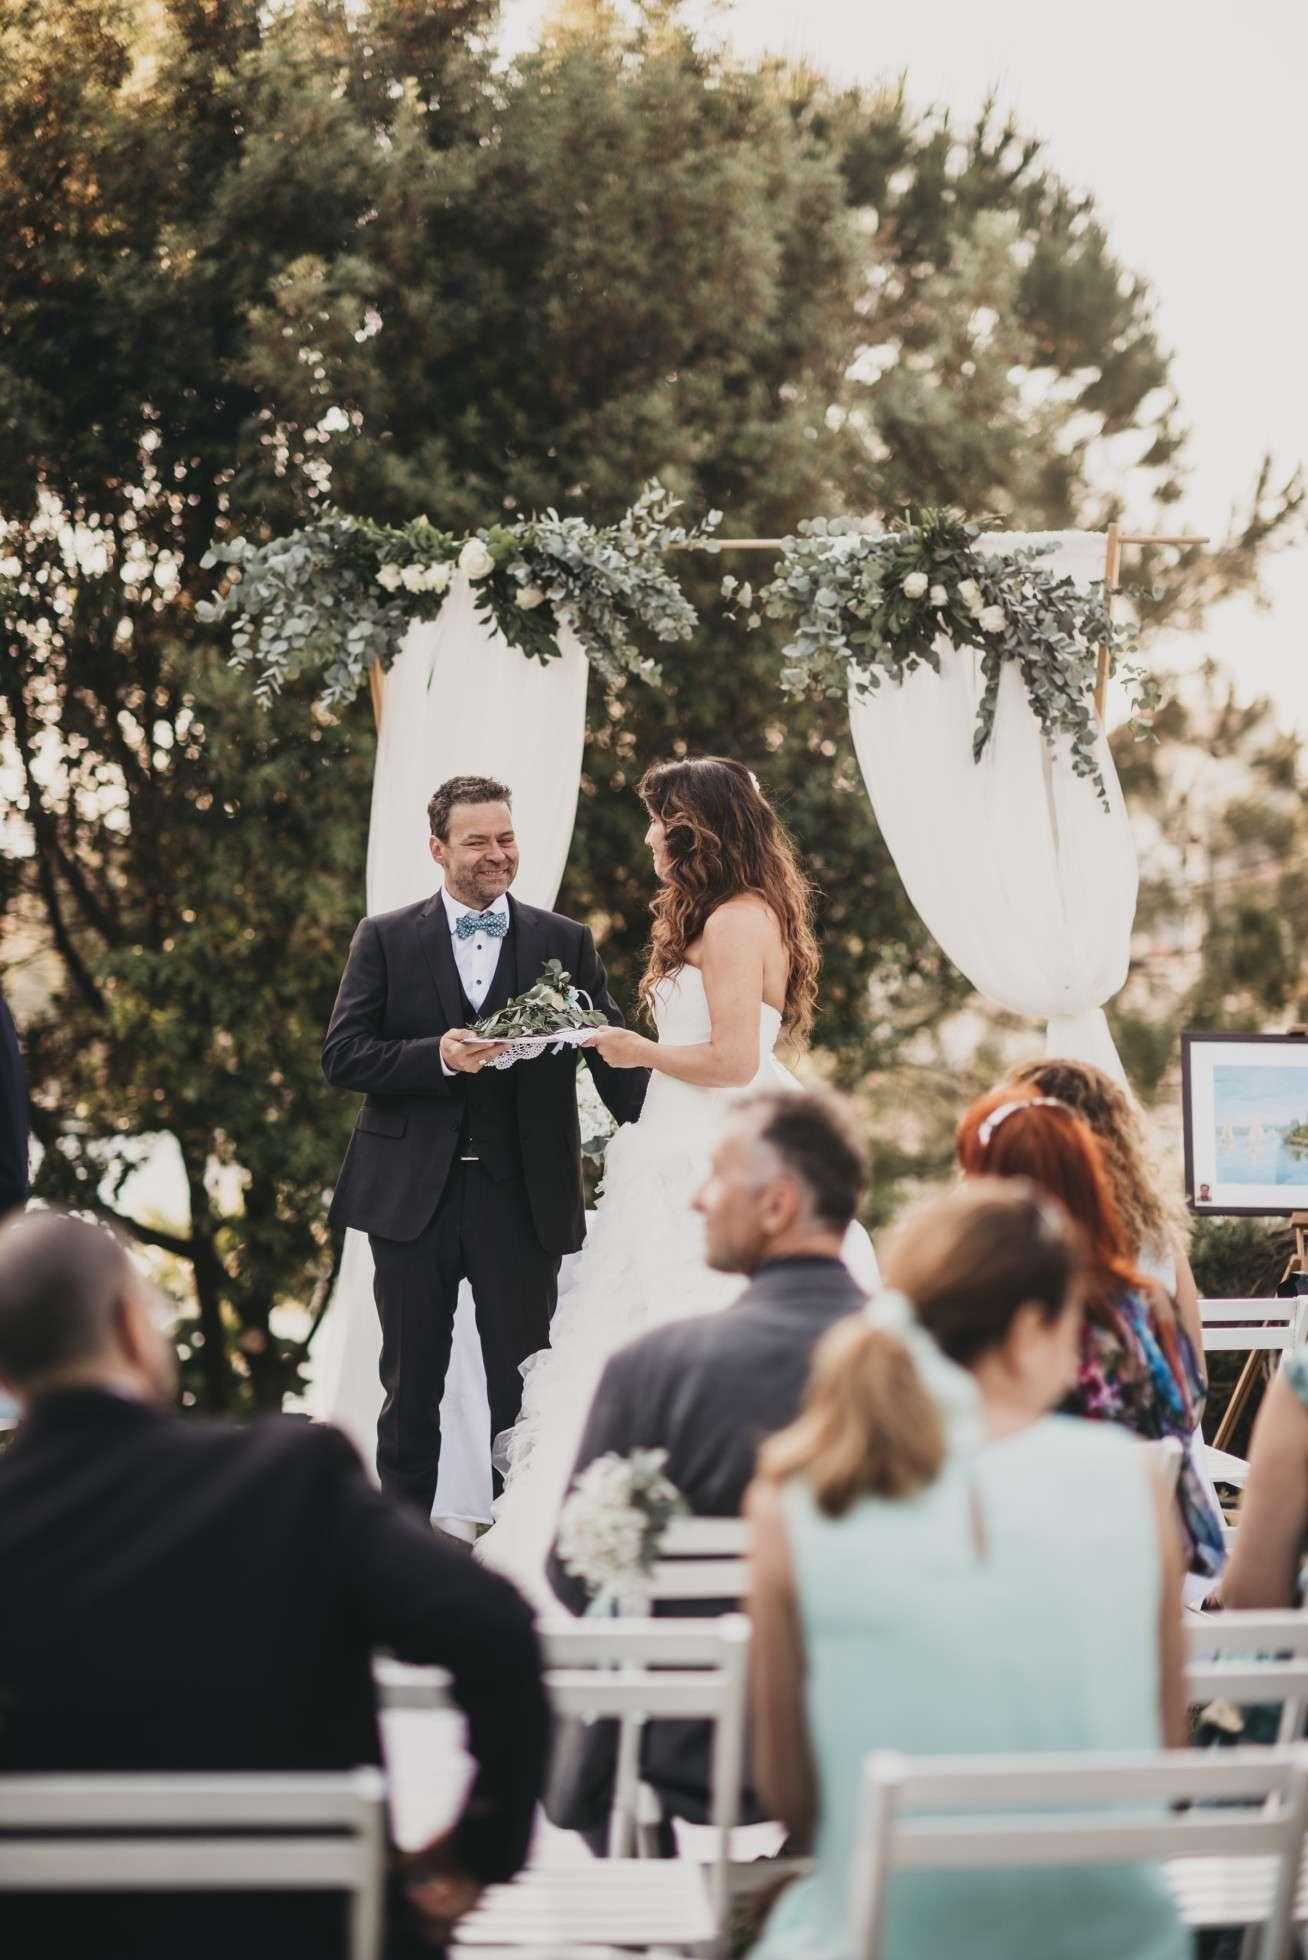 solta; maslinica; wedding in croatia; island wedding; heirten in kroatien; heiraten auf insel; wedding planner croatia; hochzeitsplaner kroatien; marrytale; bridal couple; brautpaar; trauung kroatien